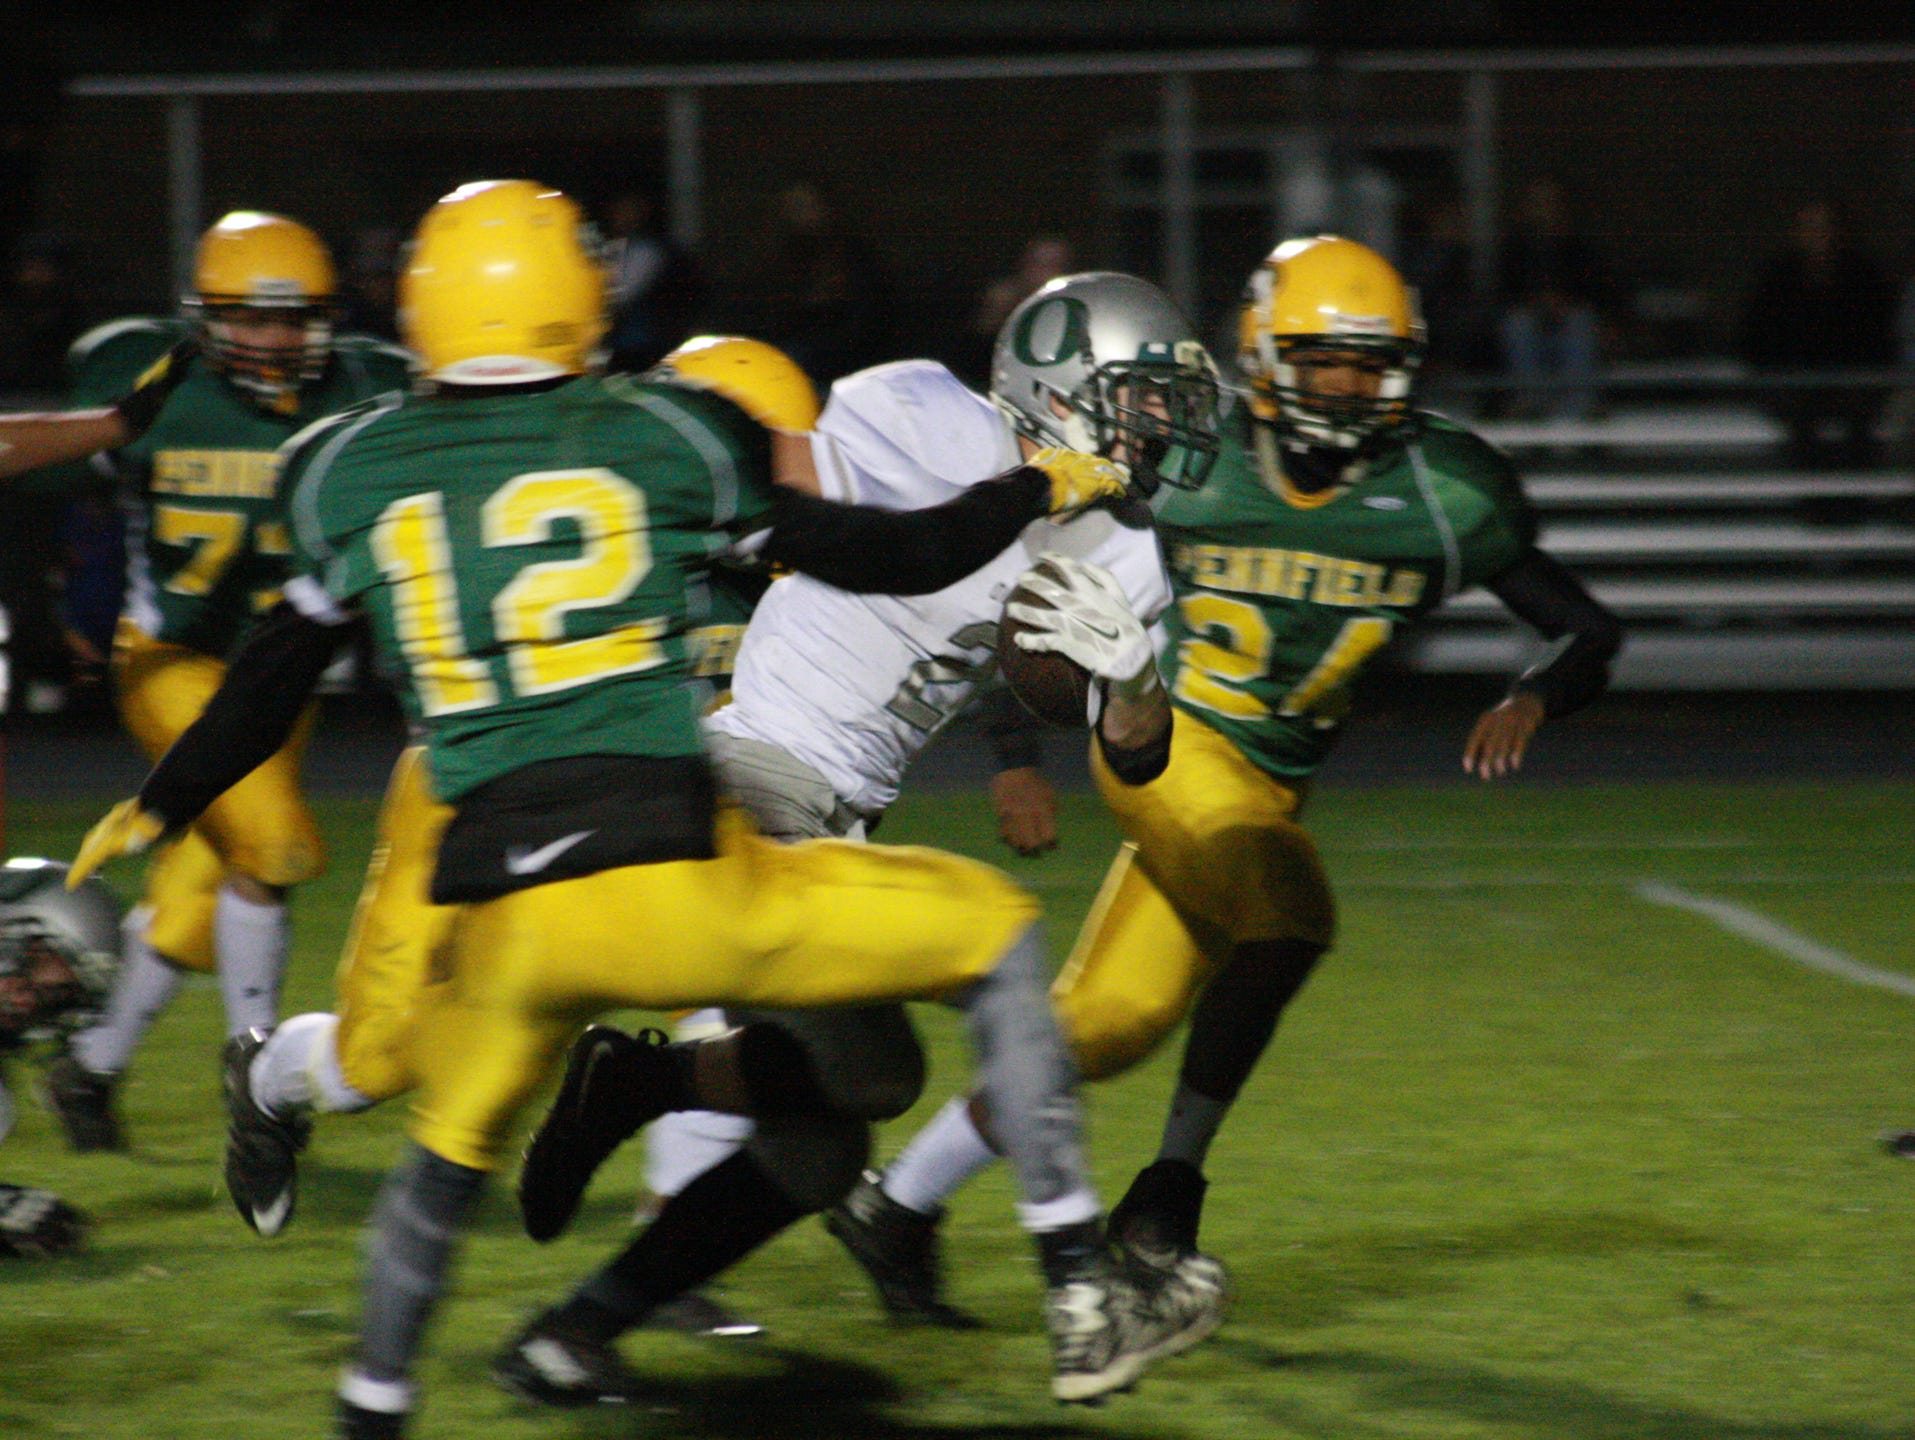 Olivet High School Senior, Wyatt Smith runs against Pennfield during Friday night's game